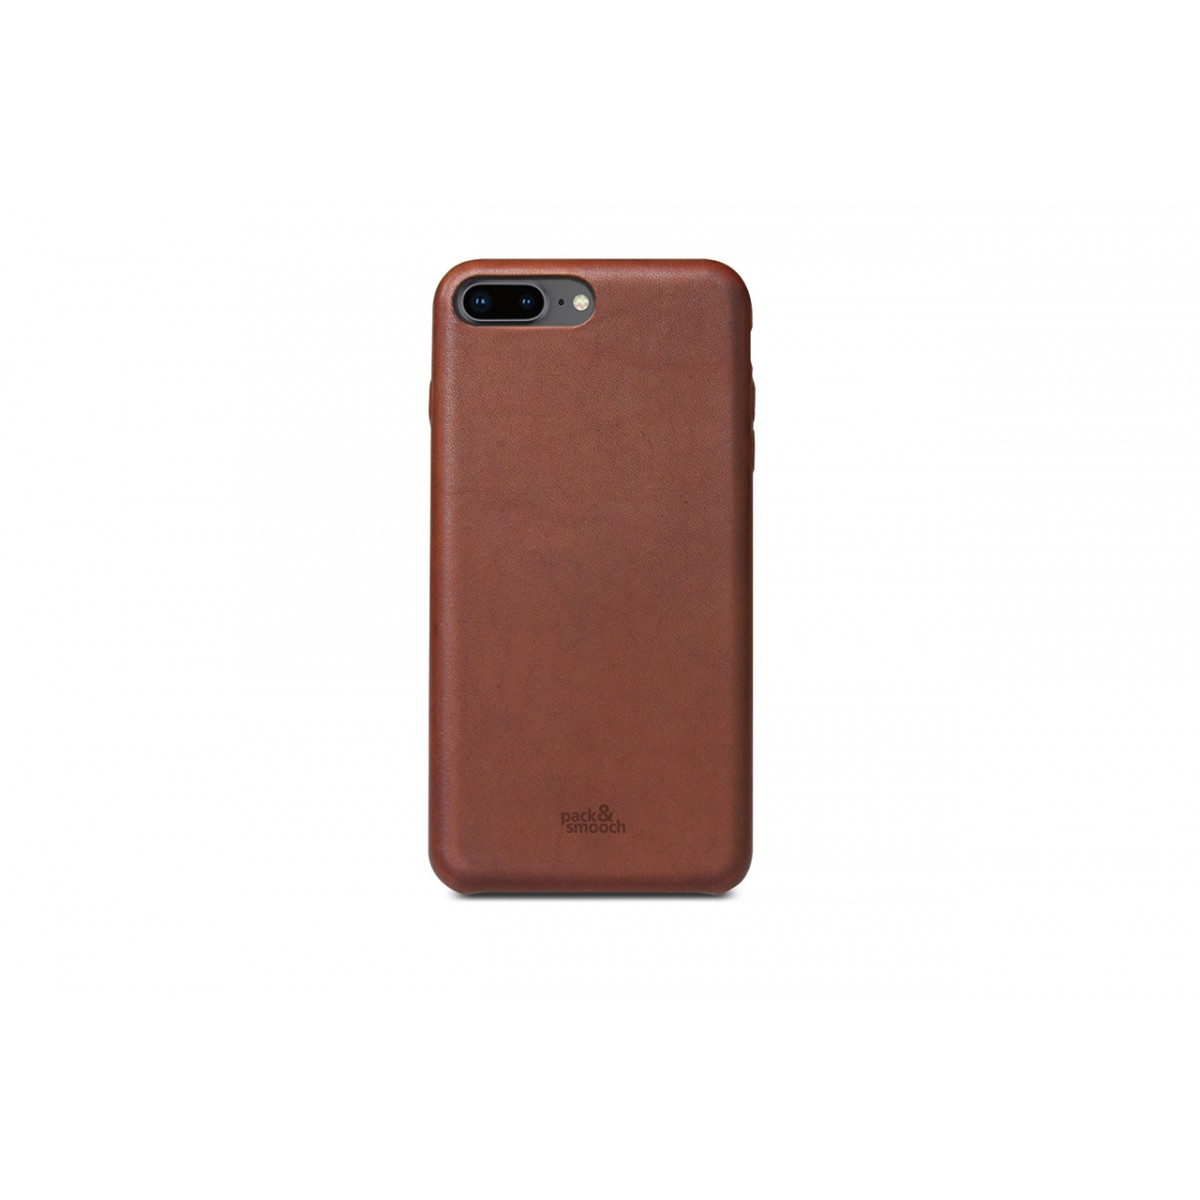 Pack & Smooch iPhone 7 PLUS Leder Hülle, Back Cover (Vegetable tanned leather)